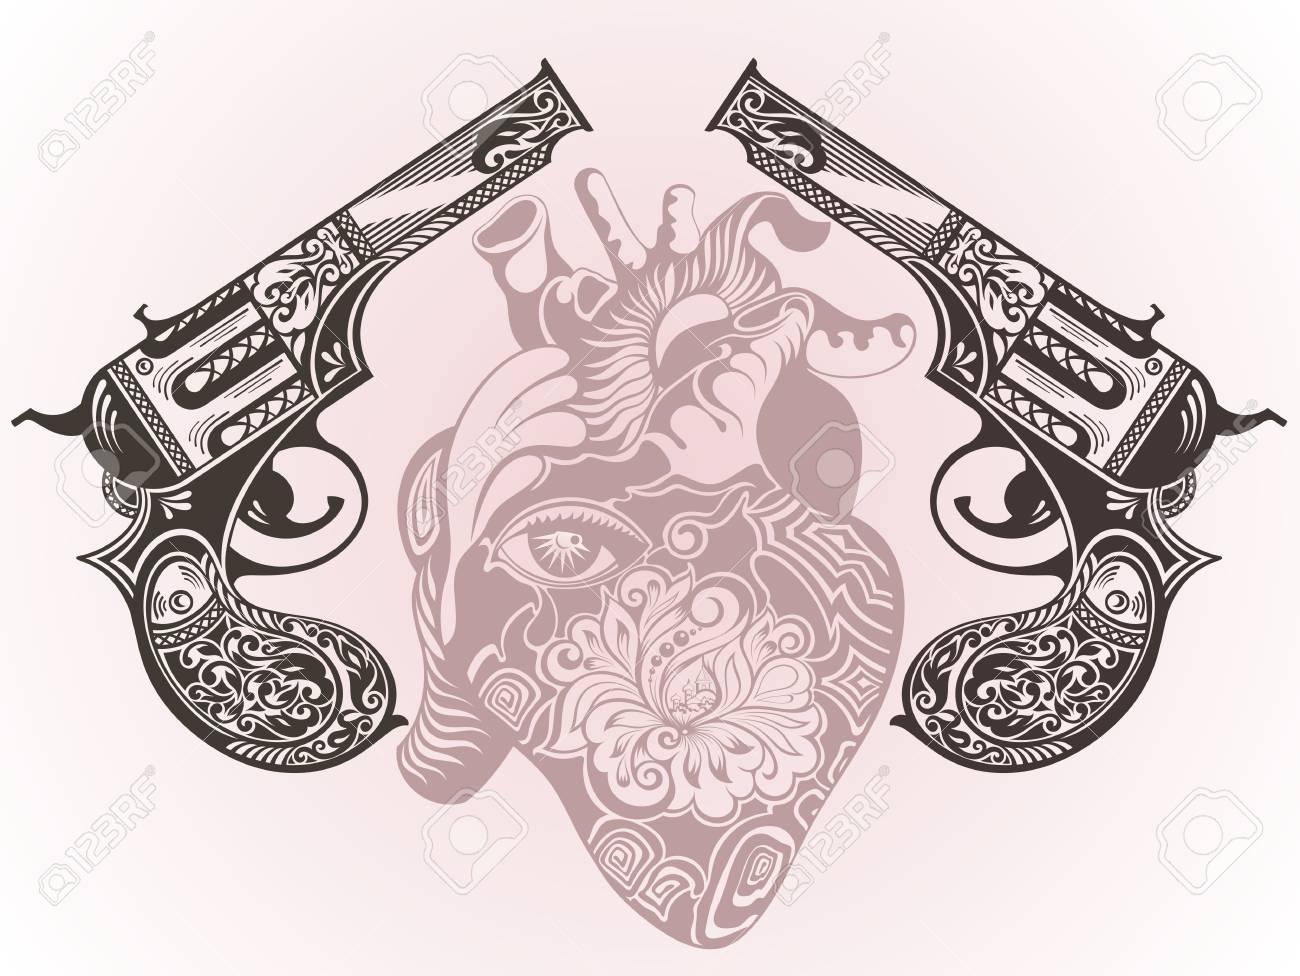 Tattoo guns with heart